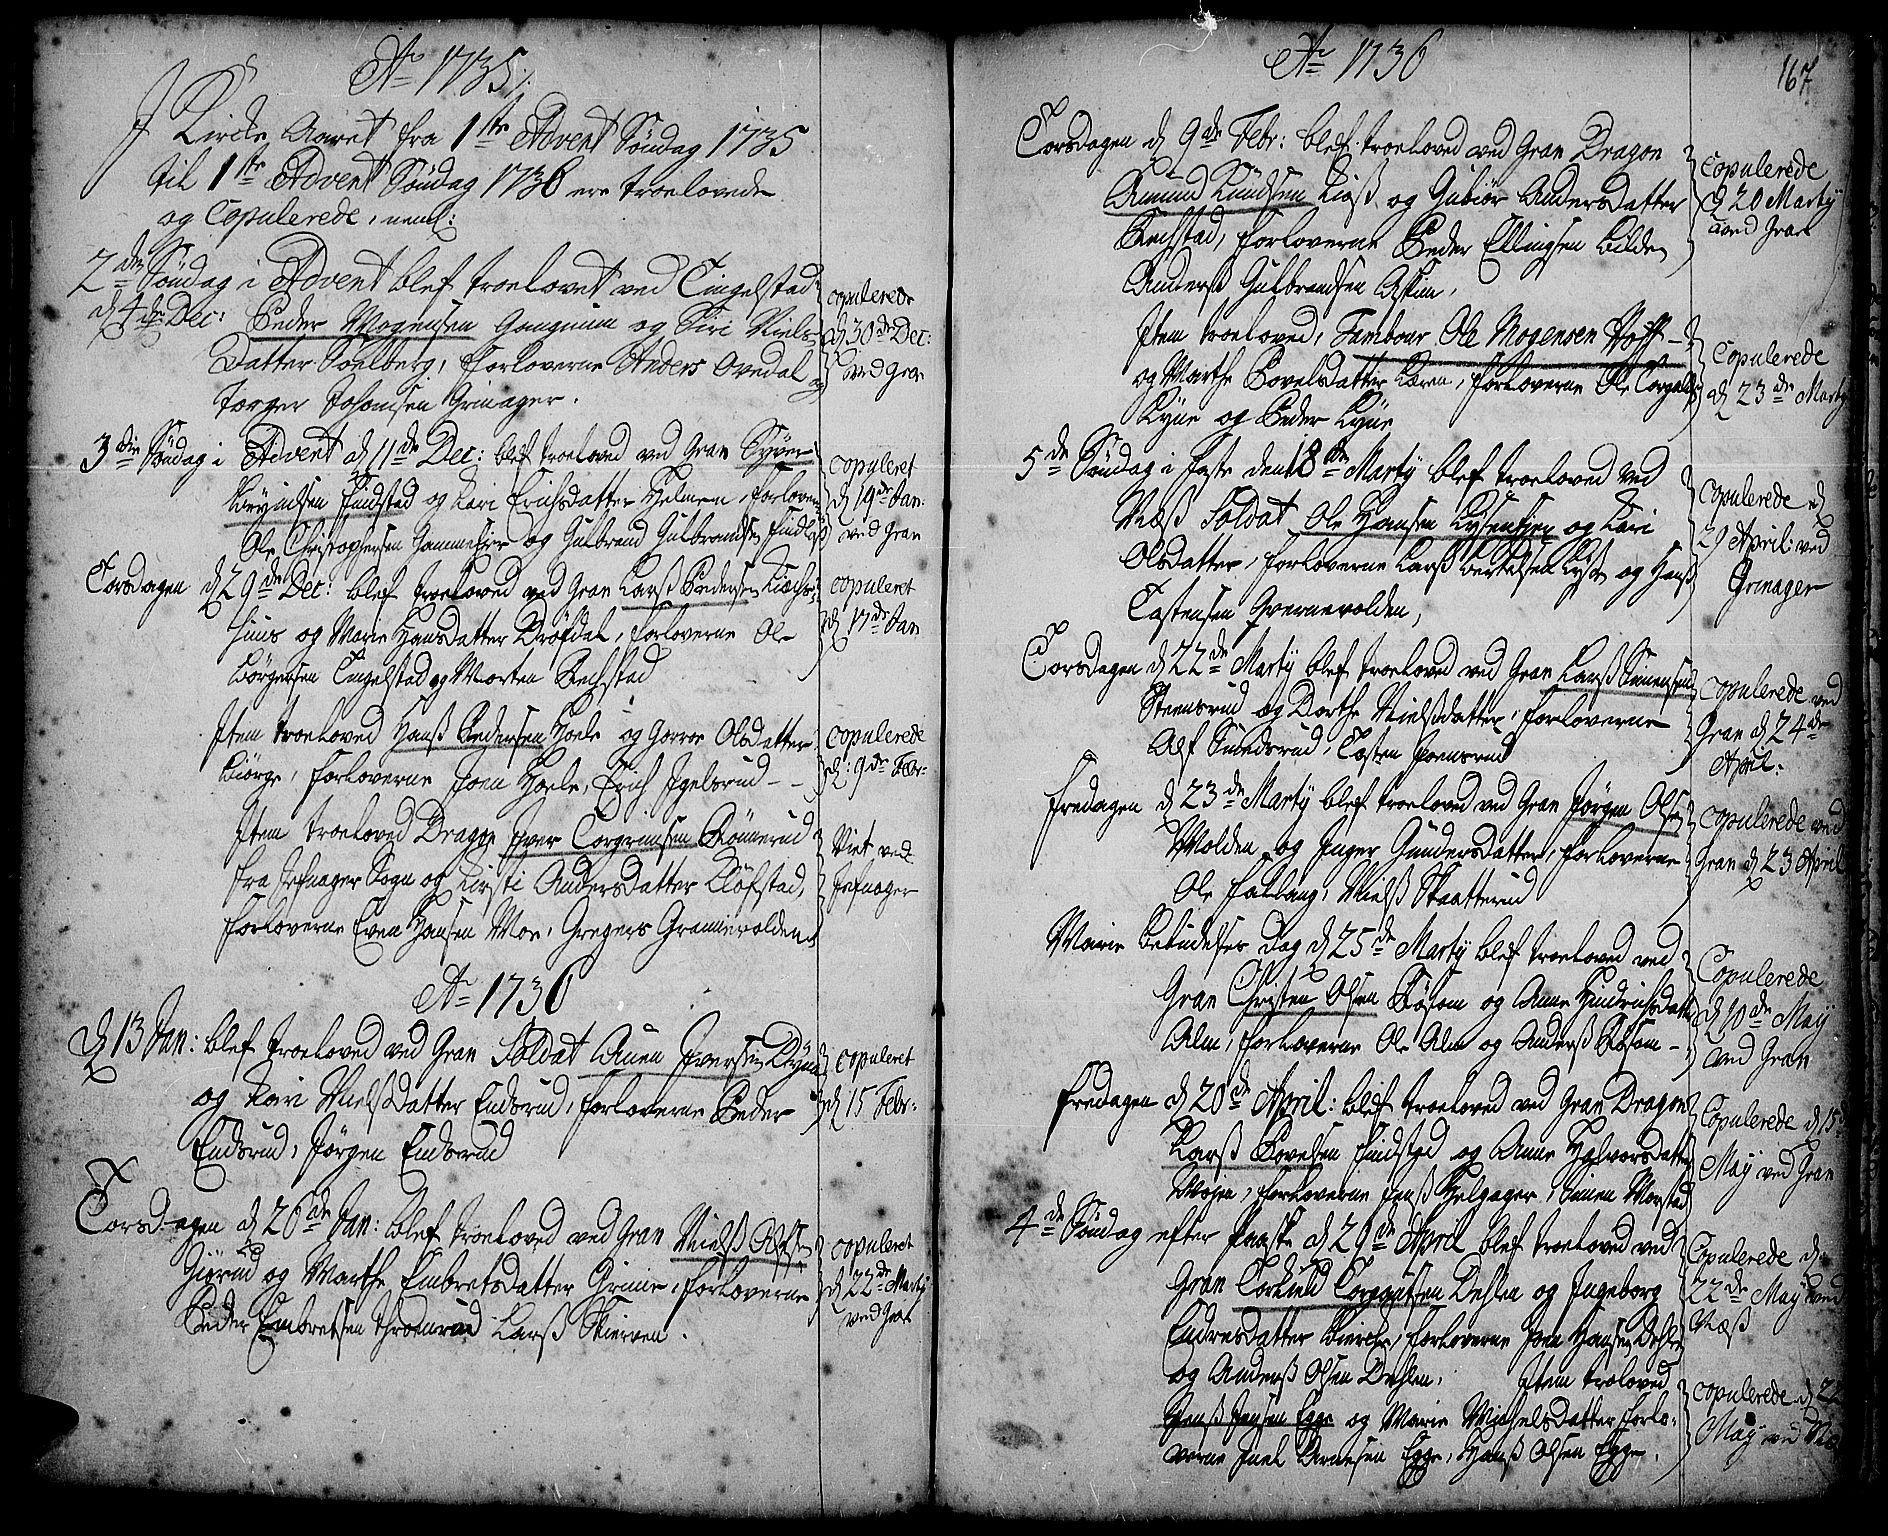 SAH, Gran prestekontor, Ministerialbok nr. 2, 1732-1744, s. 167